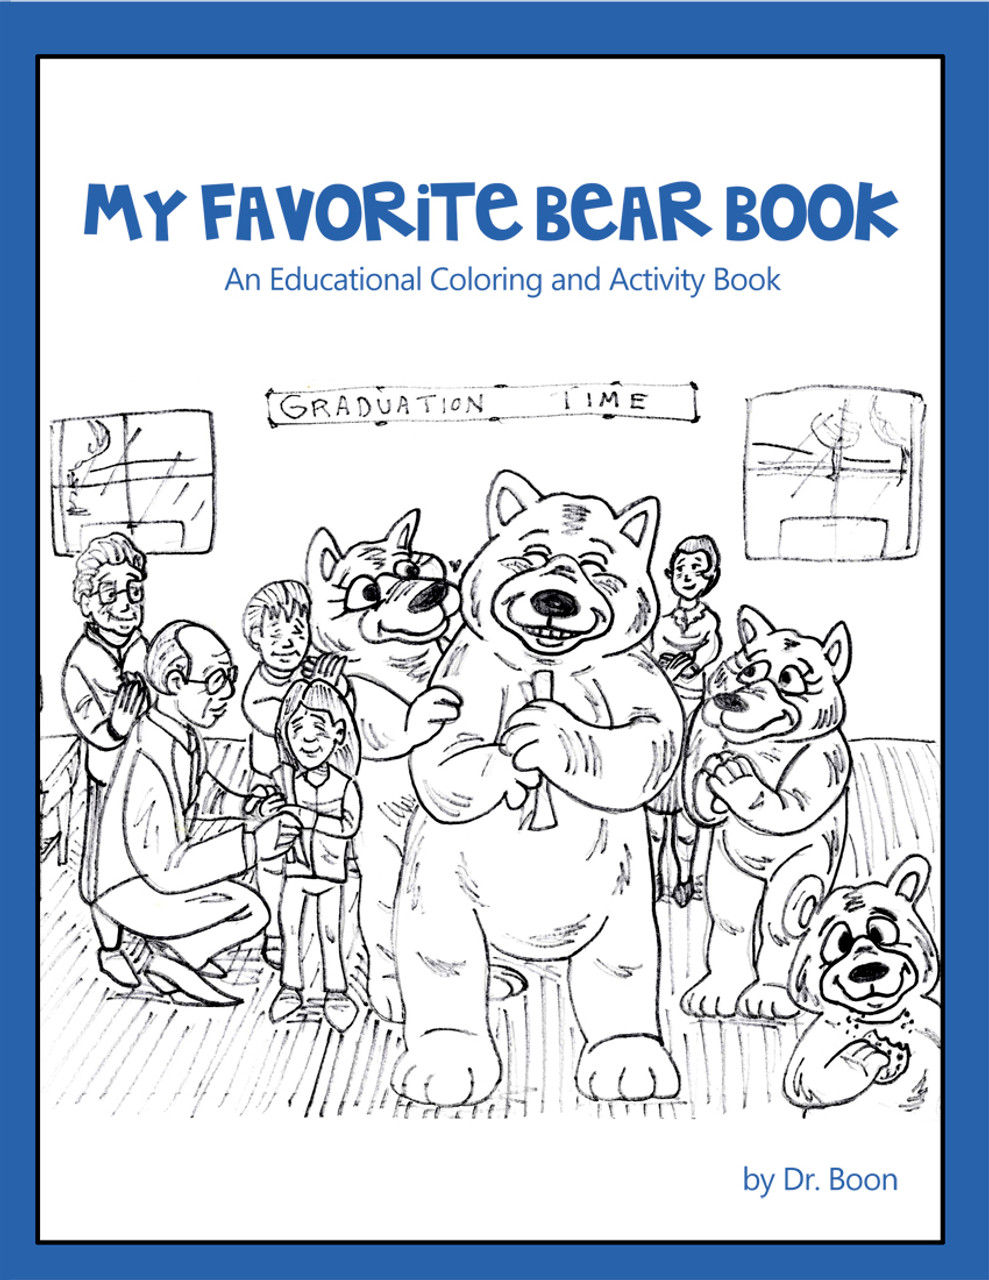 My Favorite Bear Book